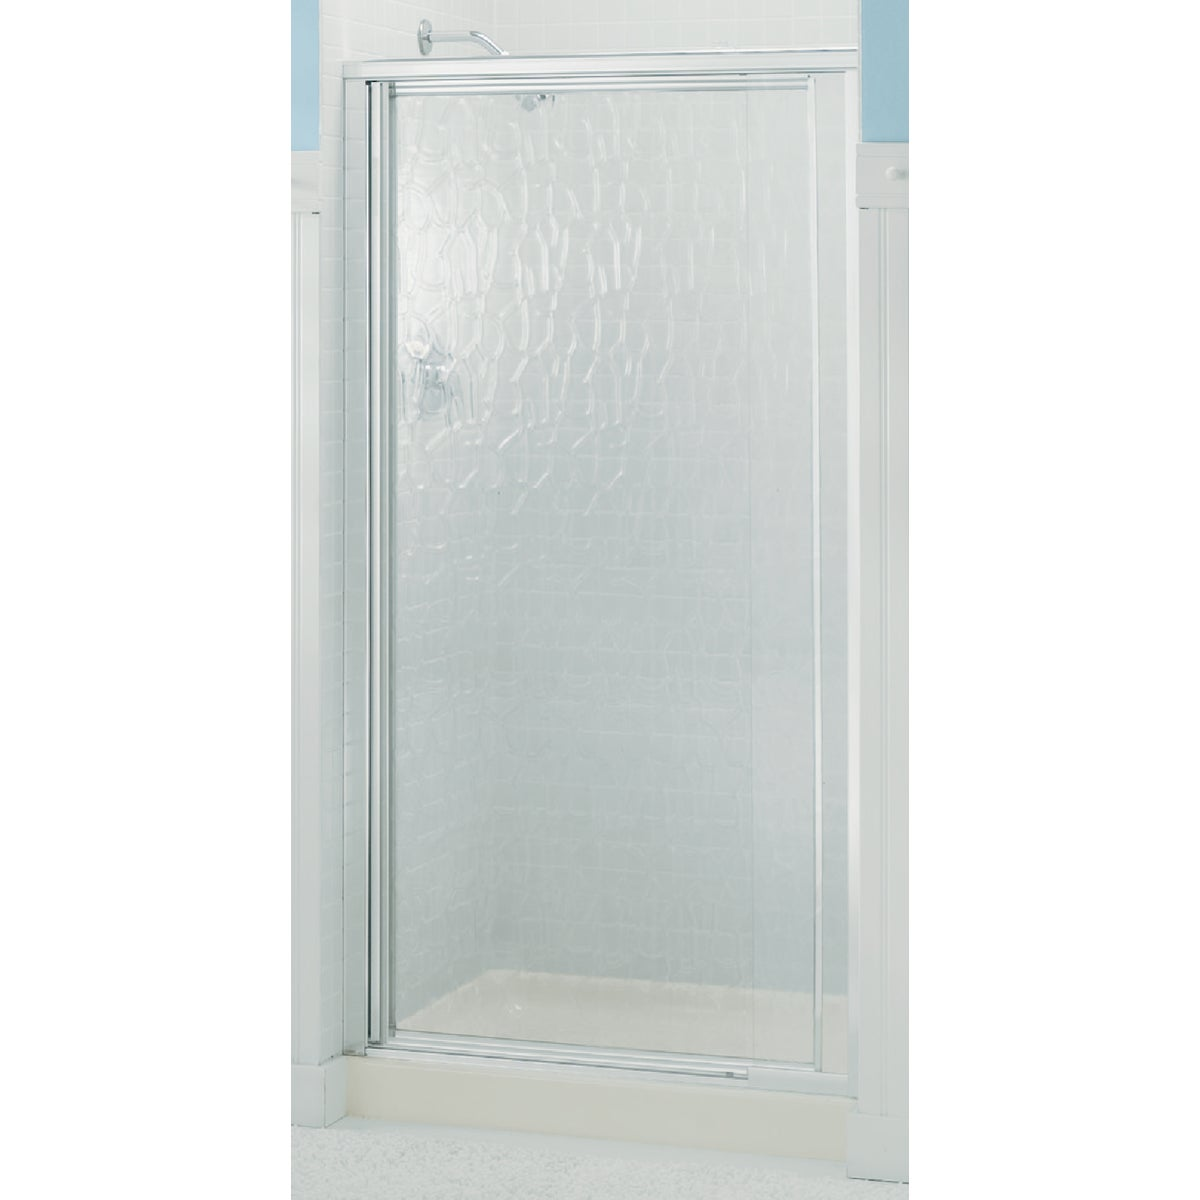 Sterling SILVER PIVOT SHOWER DOOR 1500D-27S